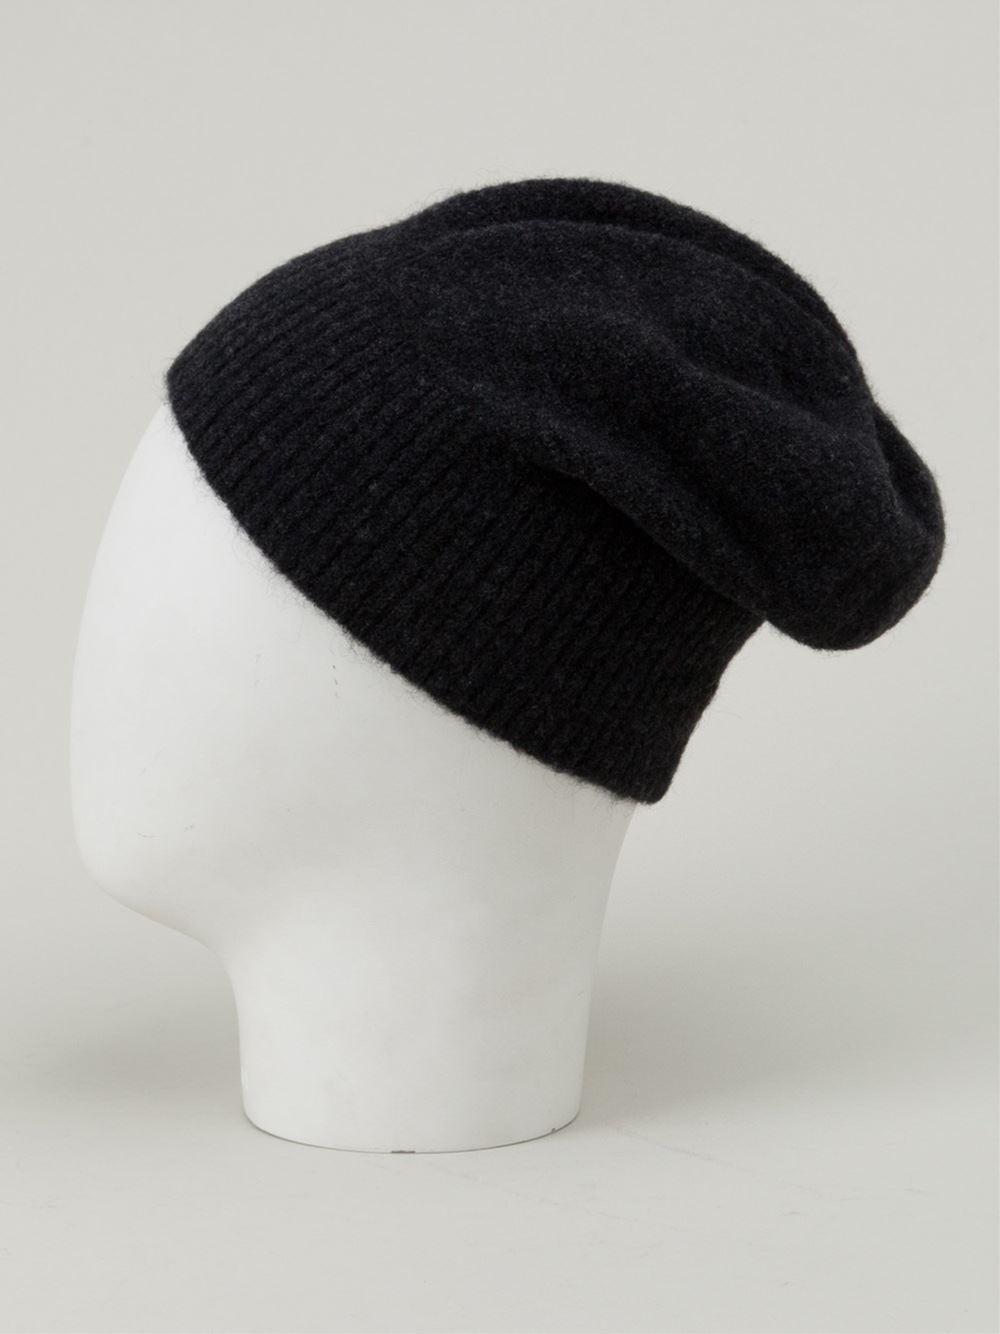 c9a5656b1bf Lyst - Balenciaga Beanie Hat in Black for Men